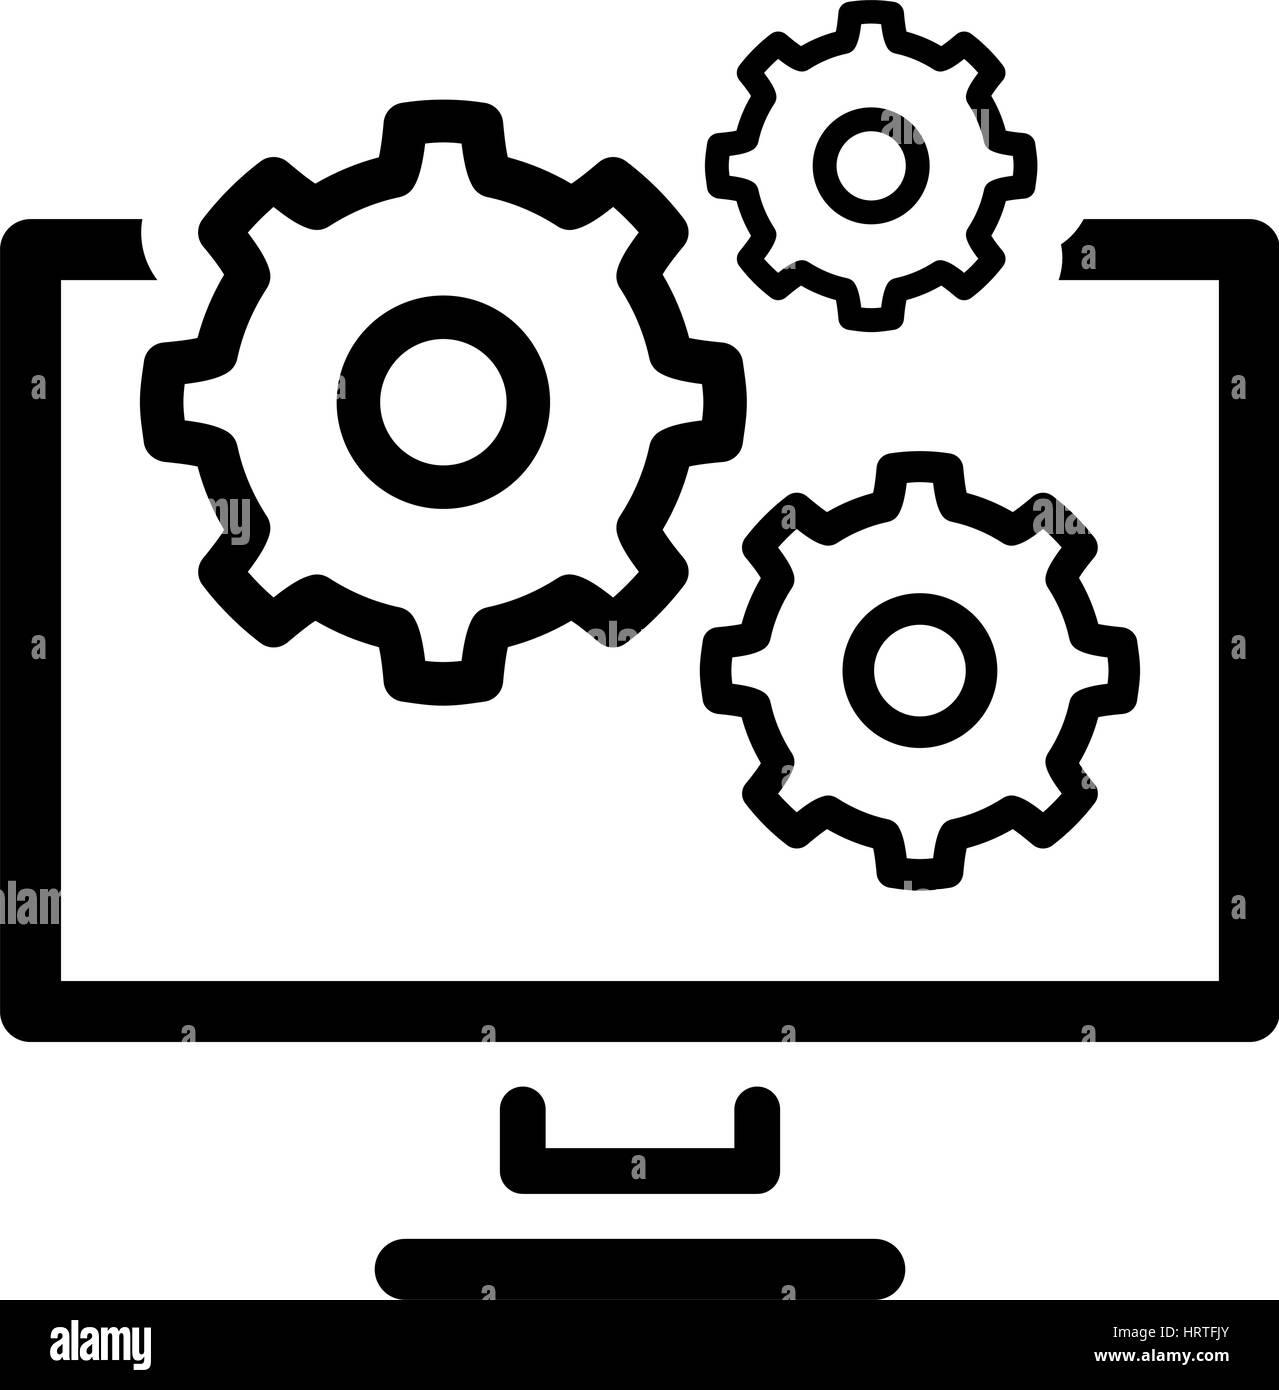 Data management icon flat design stock vector art illustration data management icon flat design biocorpaavc